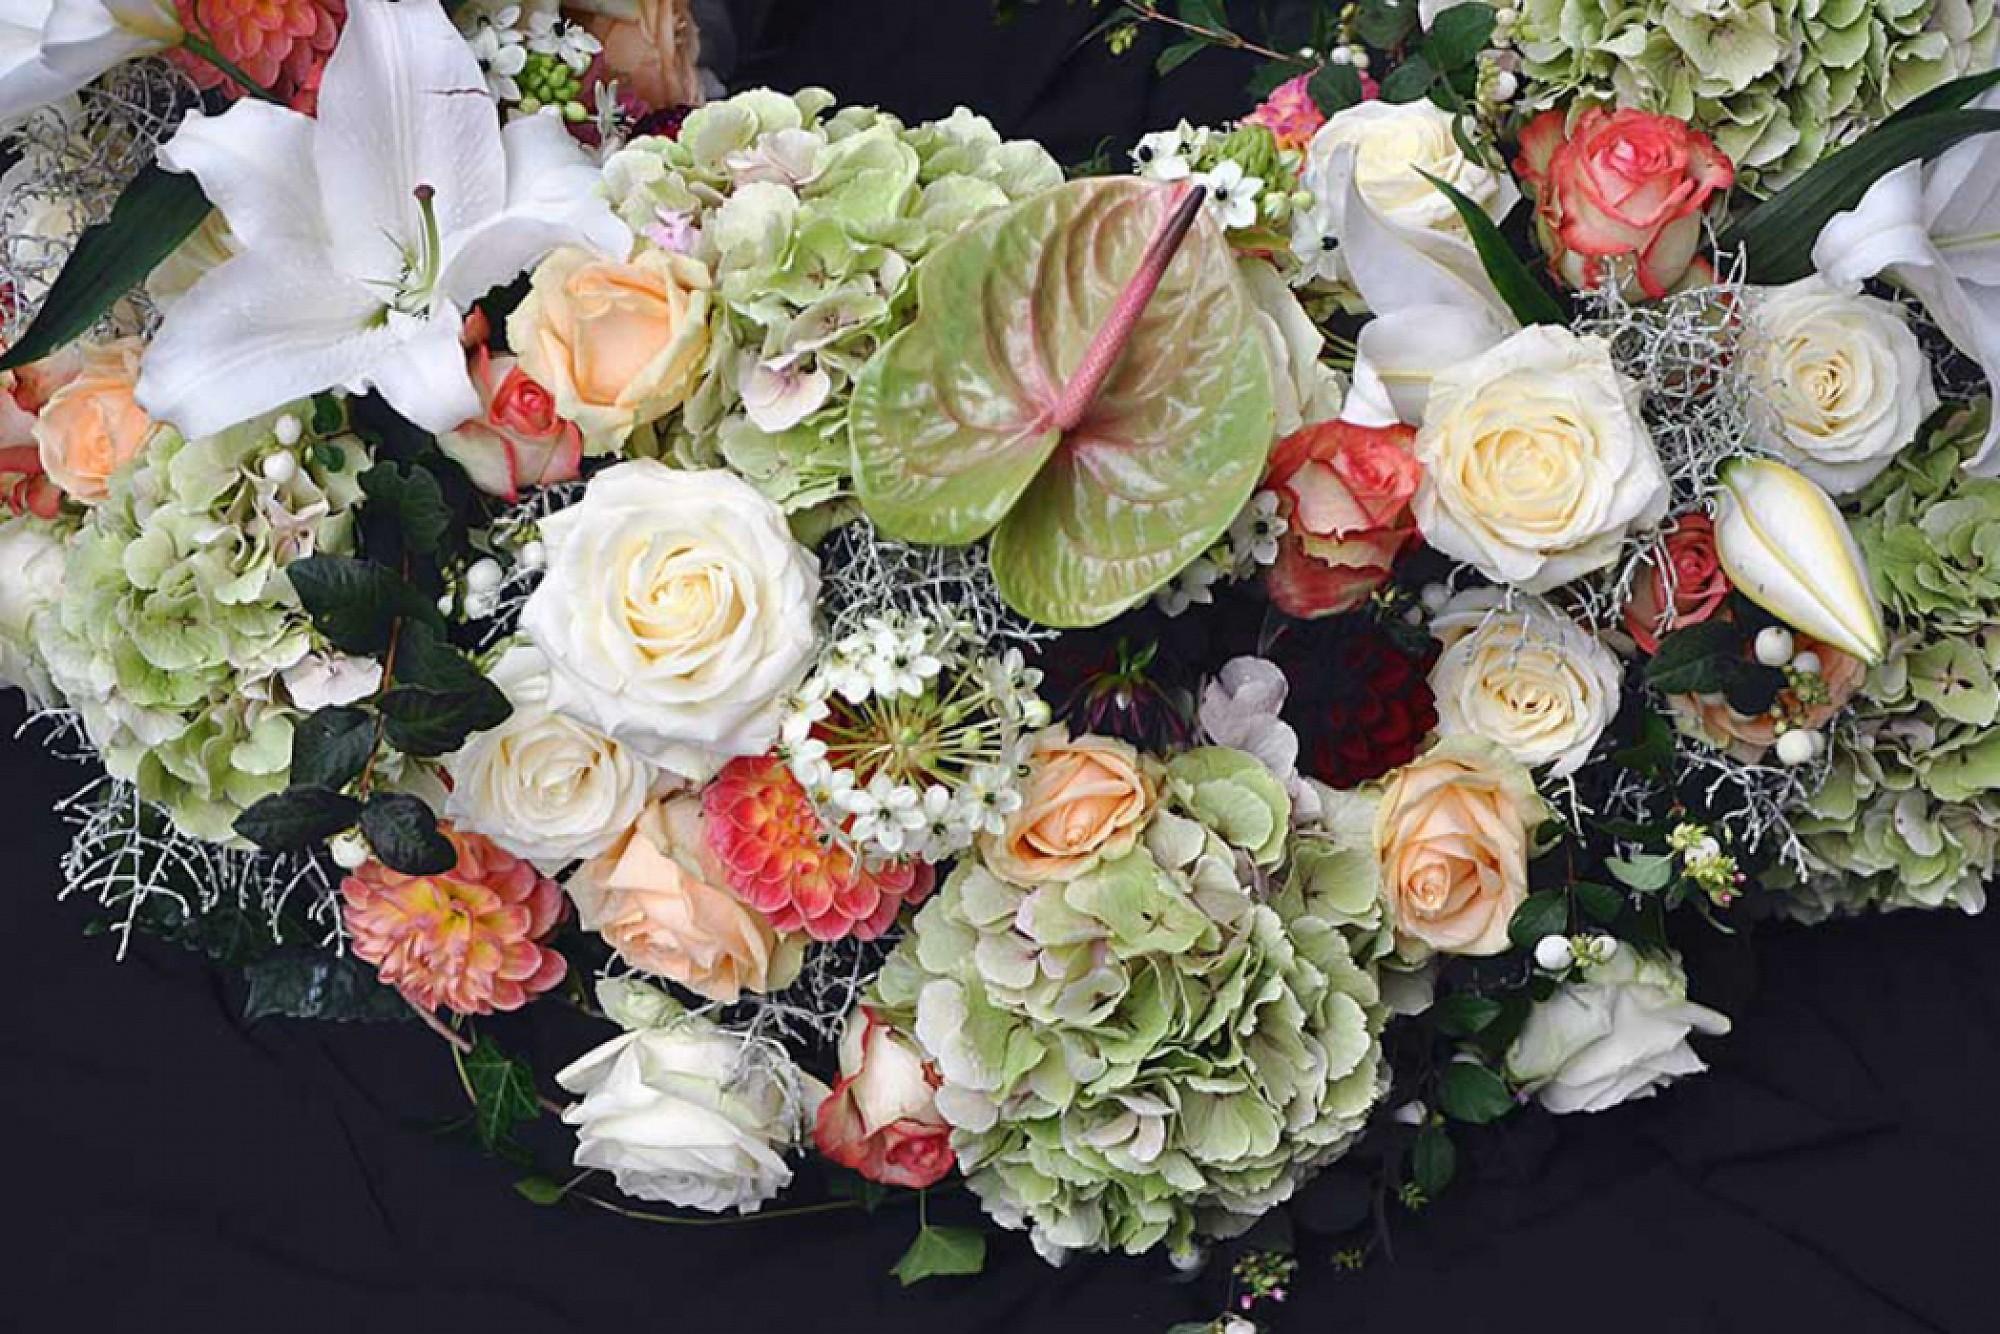 Funeral Arrangements Flowers Grave Decoration Flower Store In